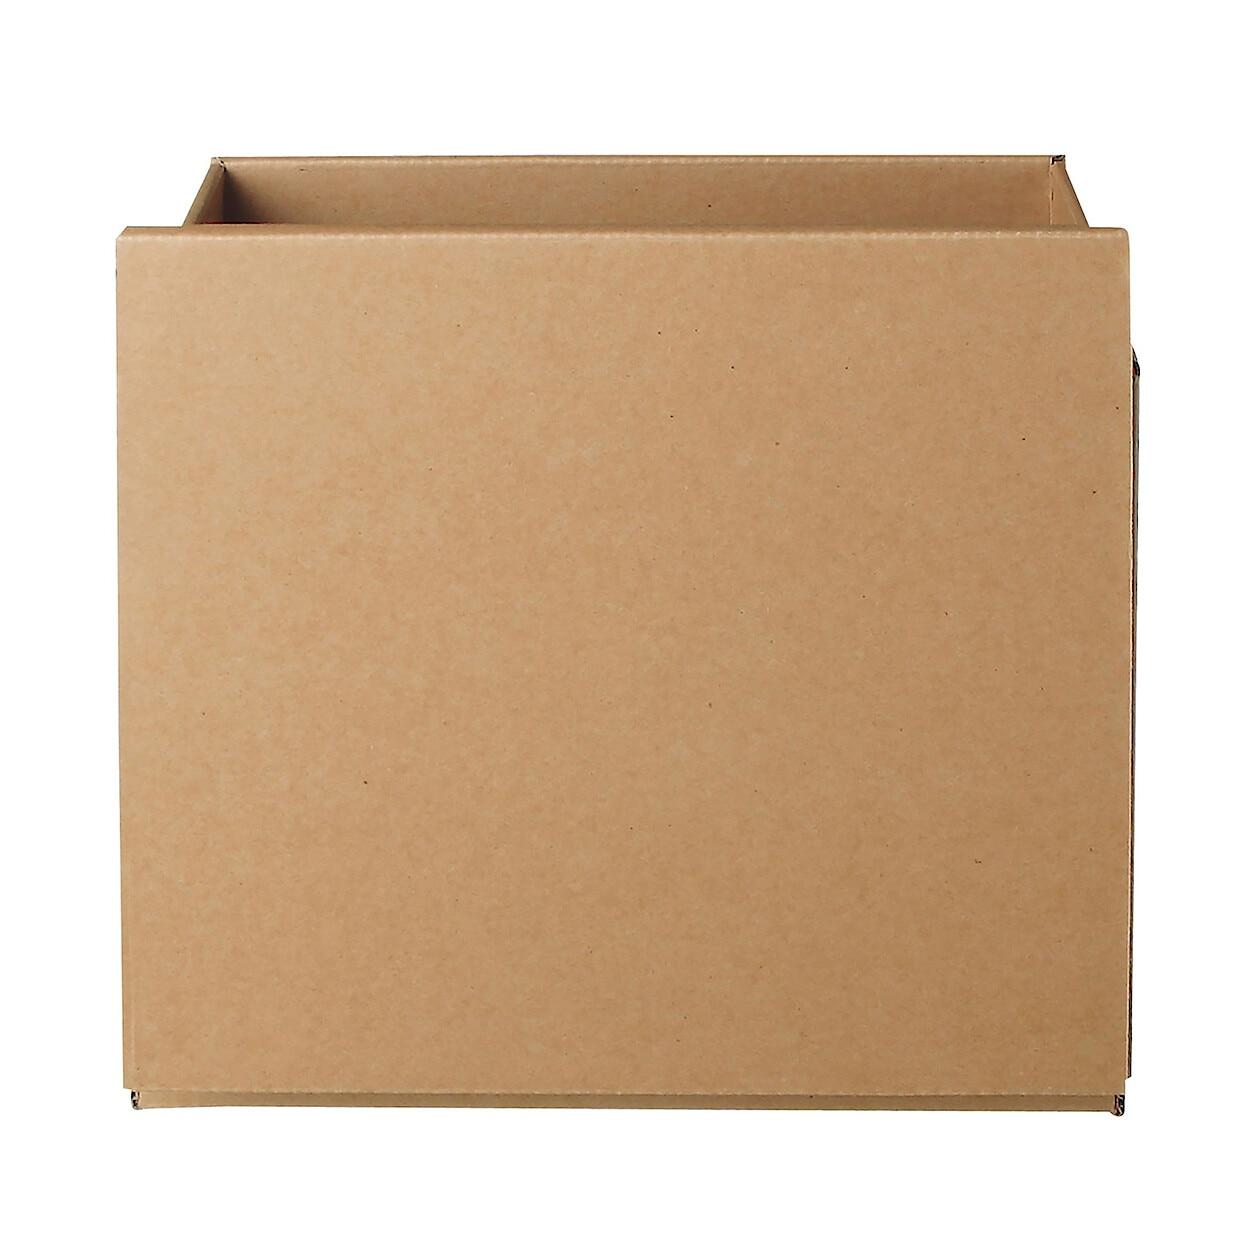 RoomClip商品情報 - ダンボール引出(パルプボードボックス用)